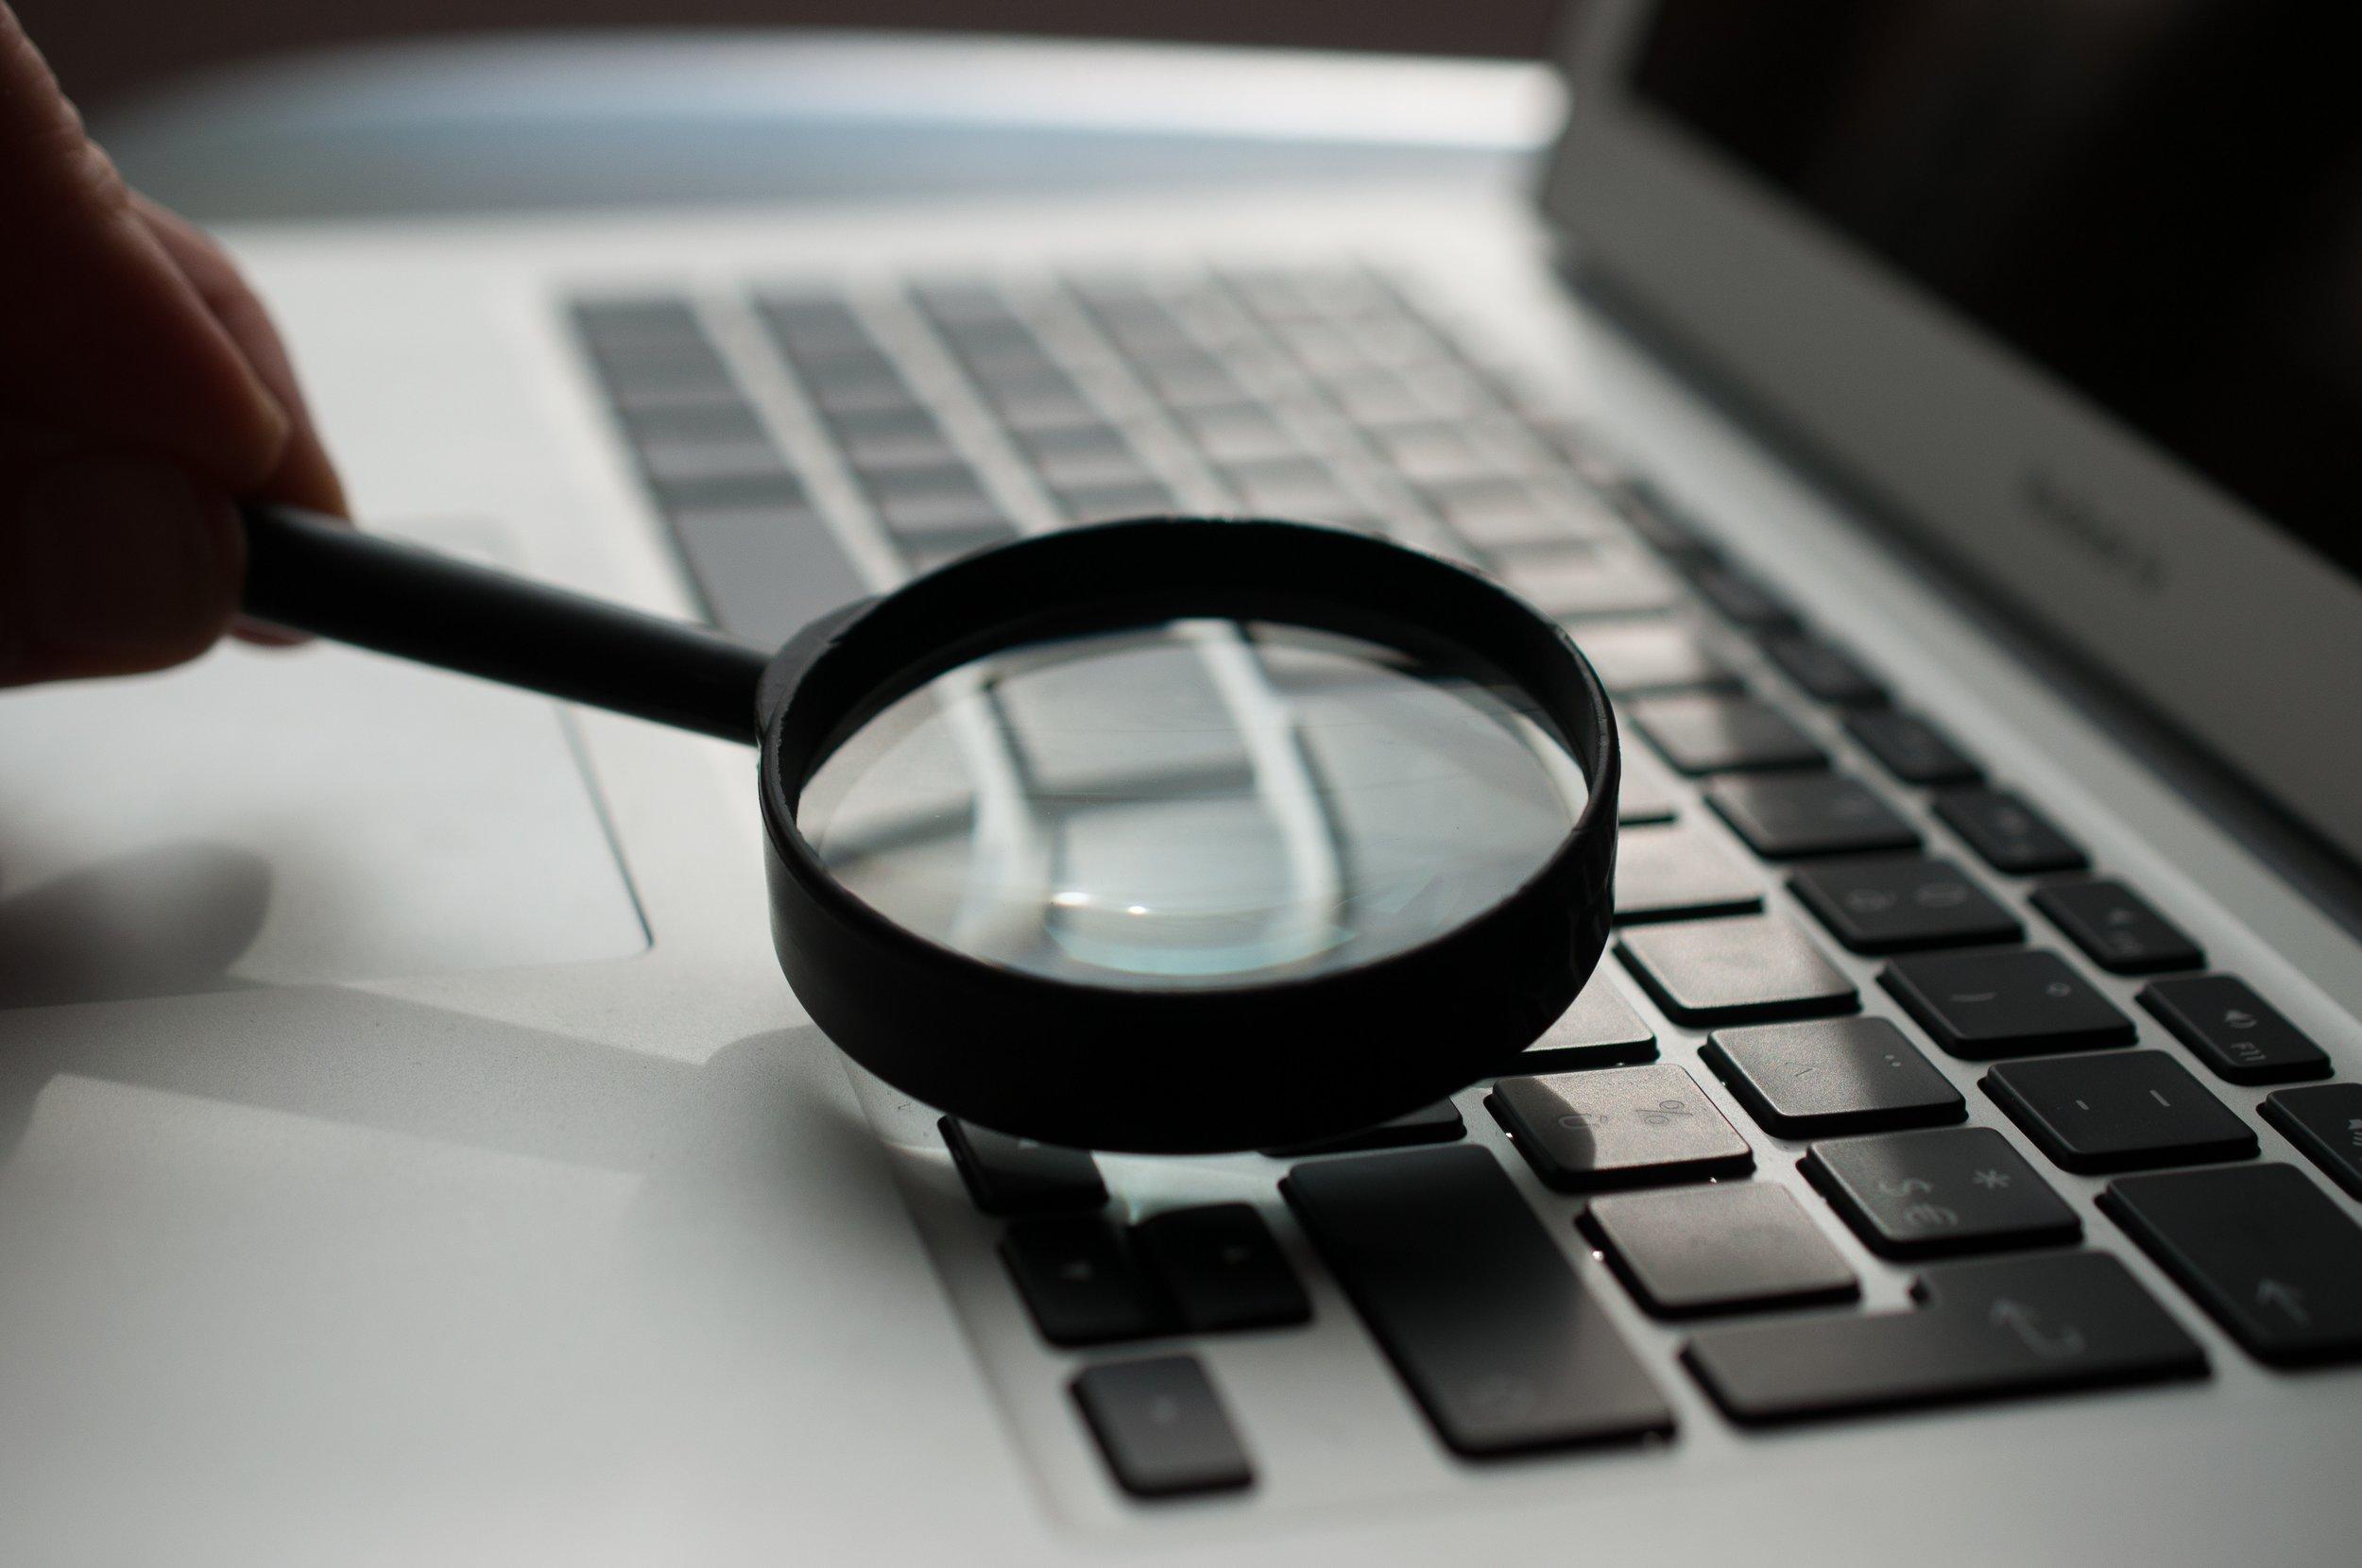 magnifying glass.jpg